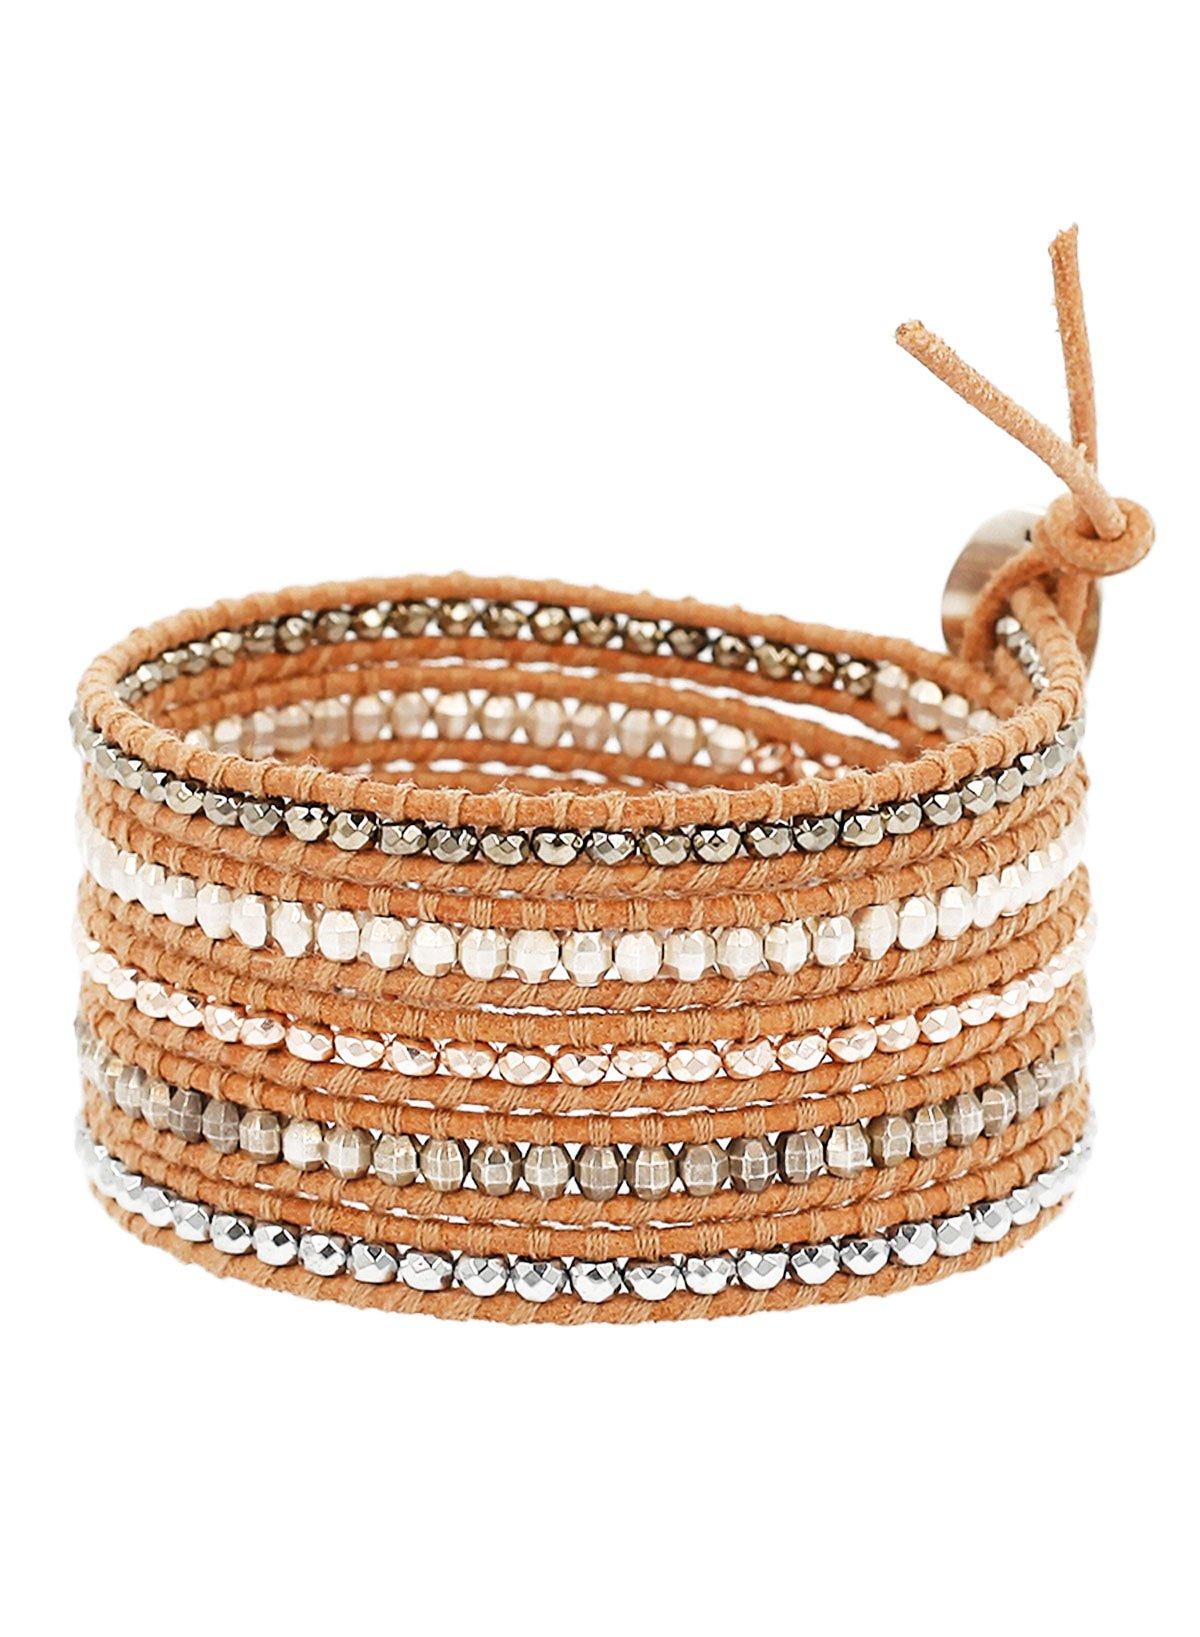 Chan Luu Hematine Mix Wrap Bracelet on Beige Leather by Chan Luu